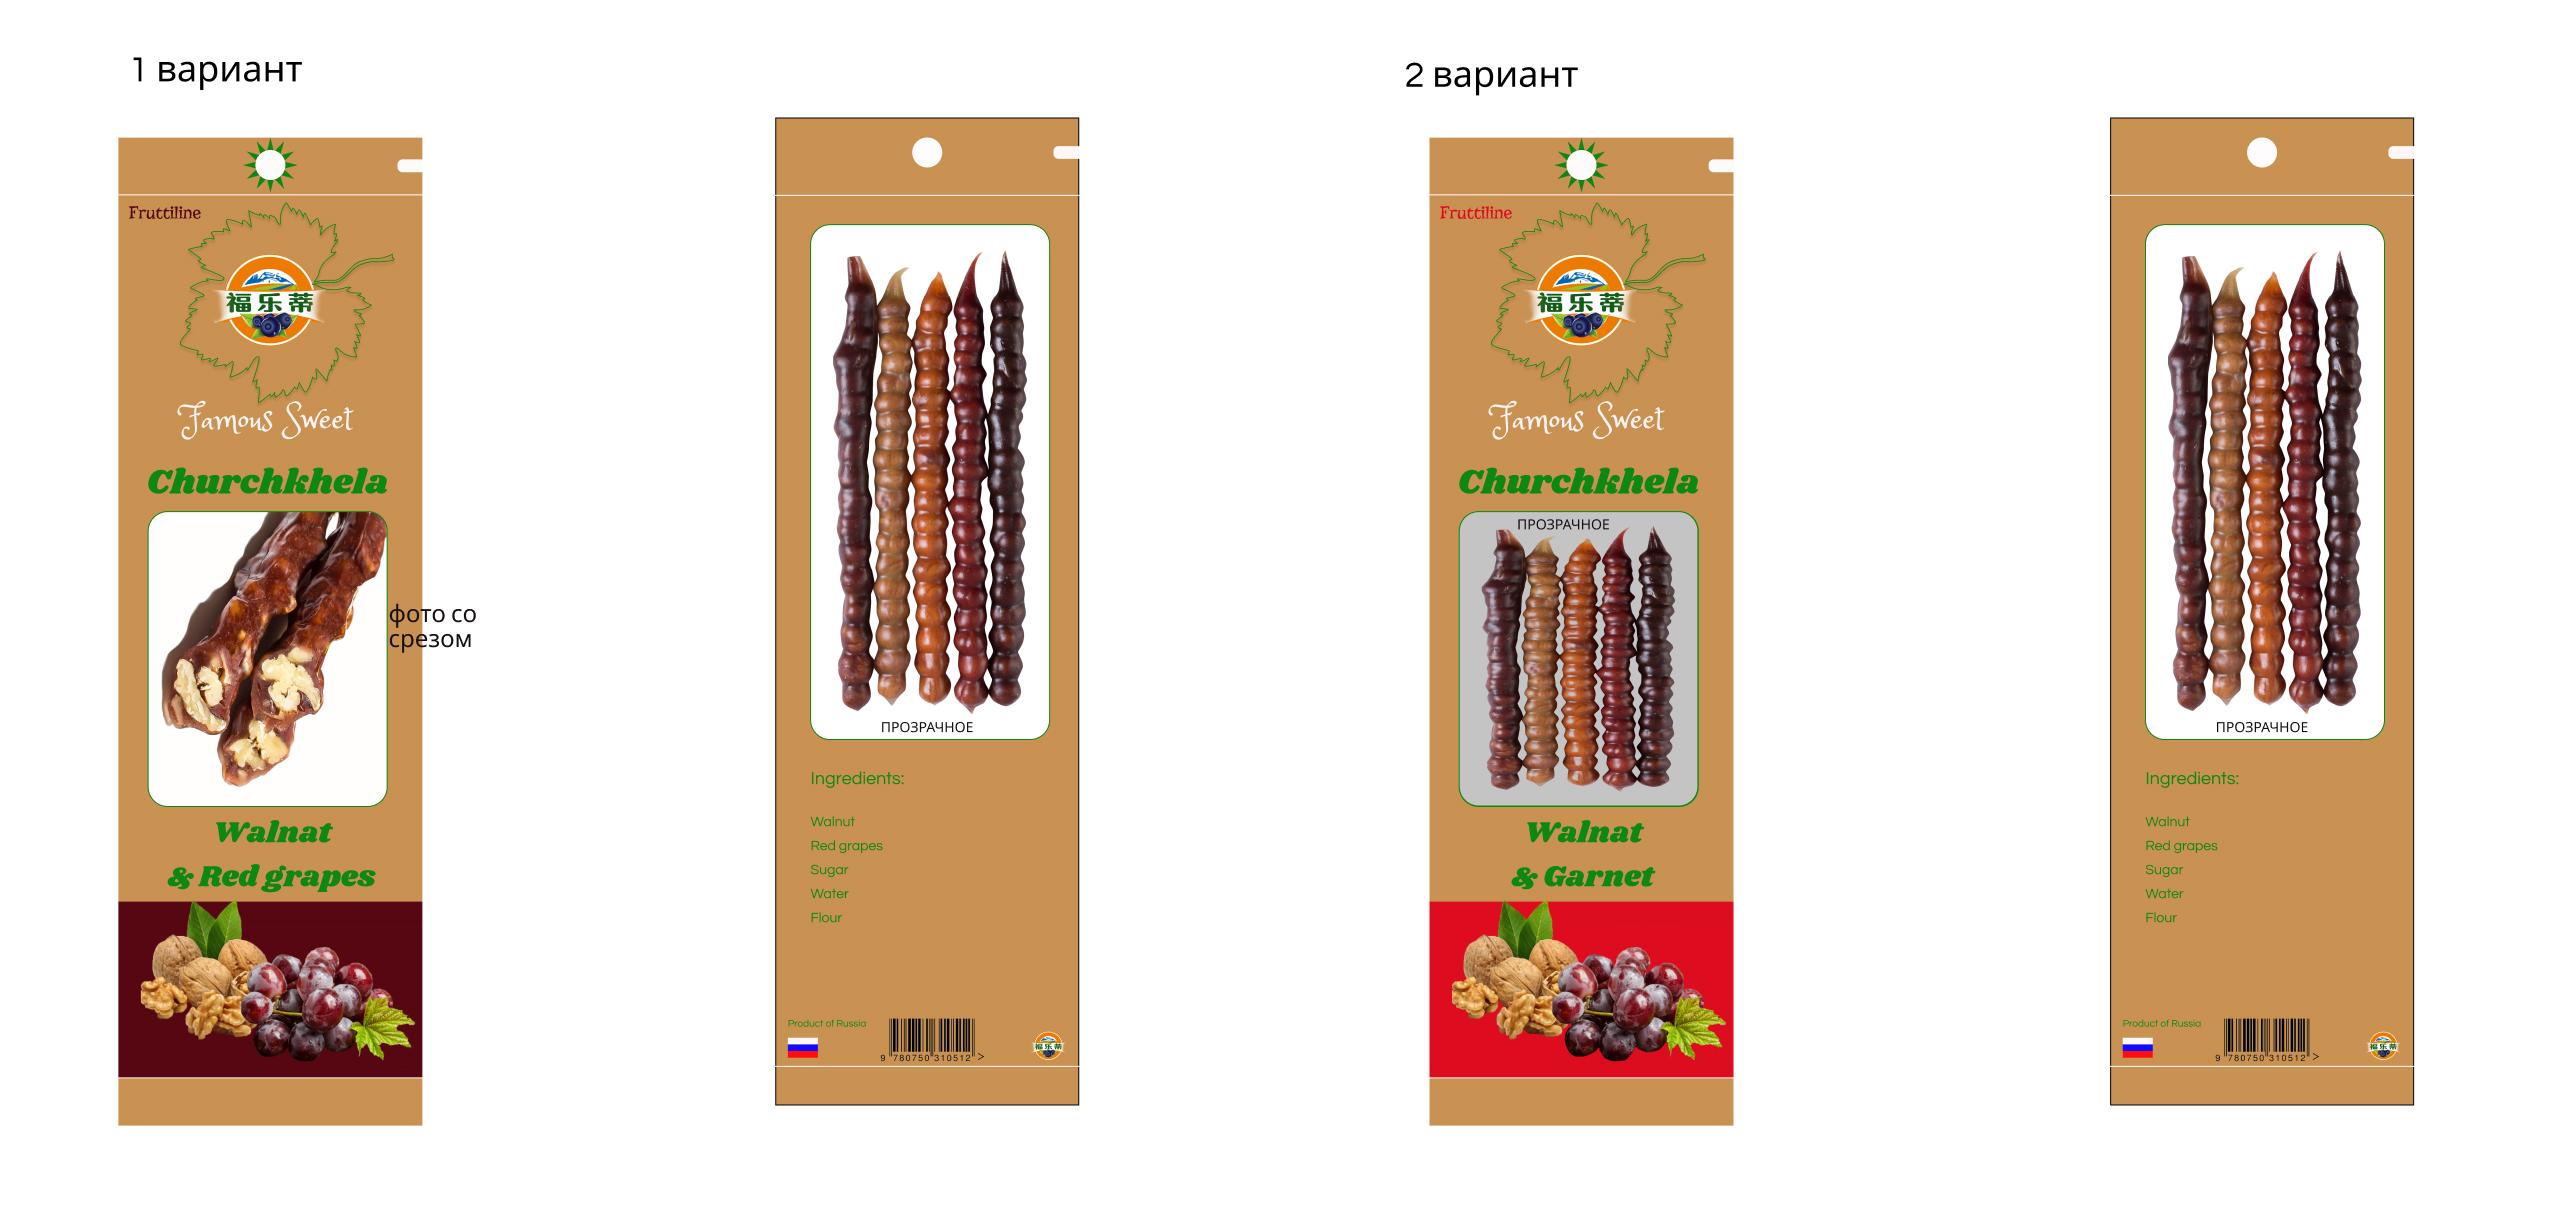 Дизайн упаквоки снеков для рынка Азии (Китай) фото f_4325f0d3cf8d9c0f.jpg